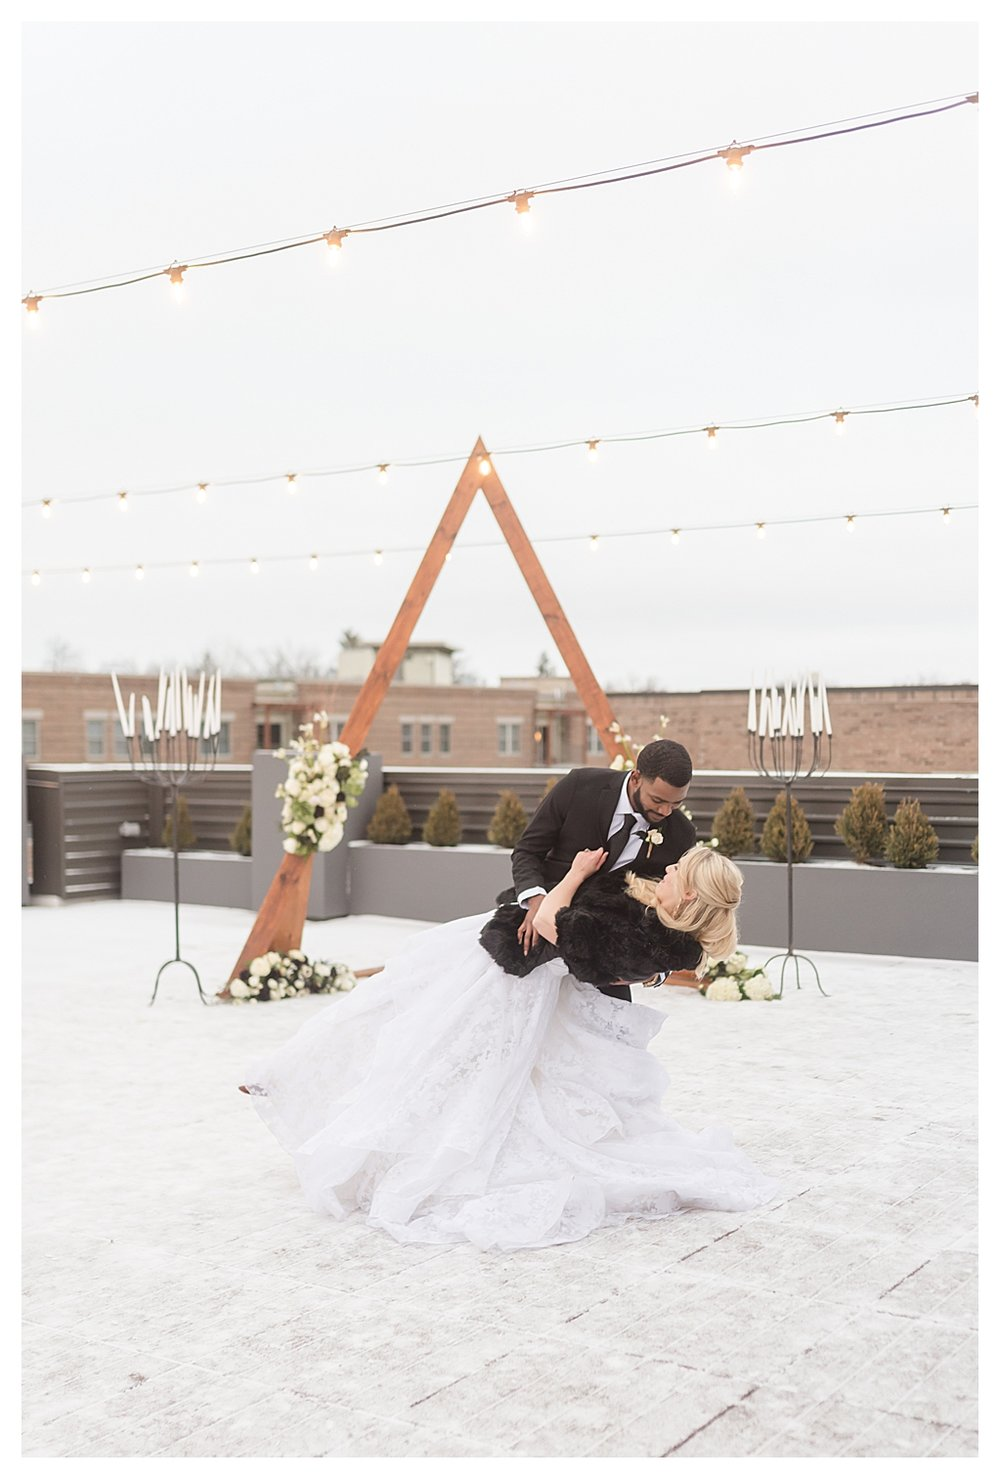 Elegant Black and White Winter Rooftop Wedding_0770.jpg